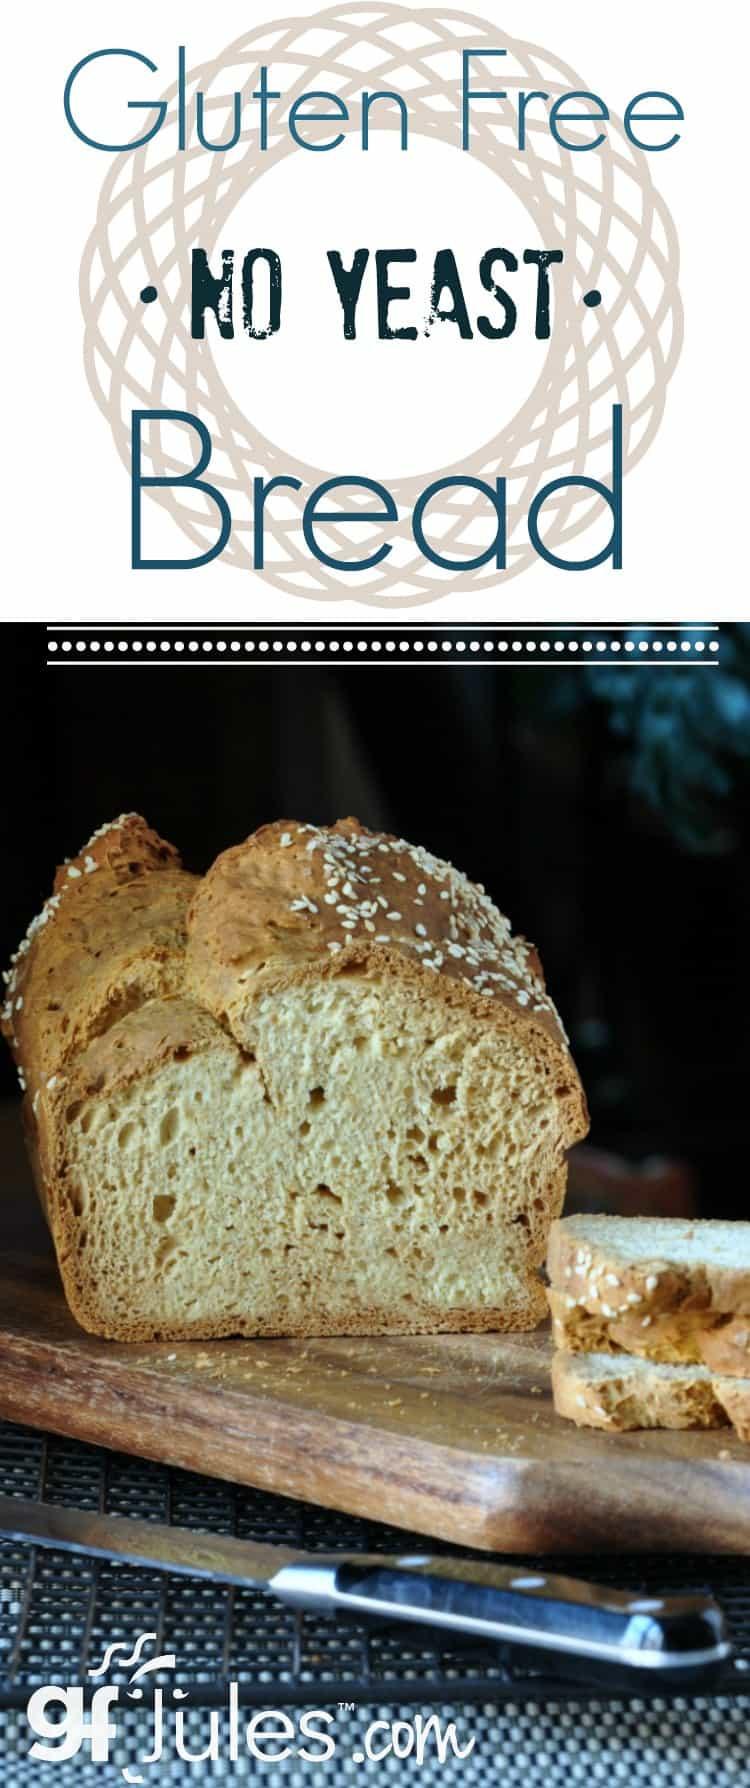 Gluten Free Yeast Bread Recipe  Gluten Free No Yeast Bread Recipe for Sandwiches gfJules